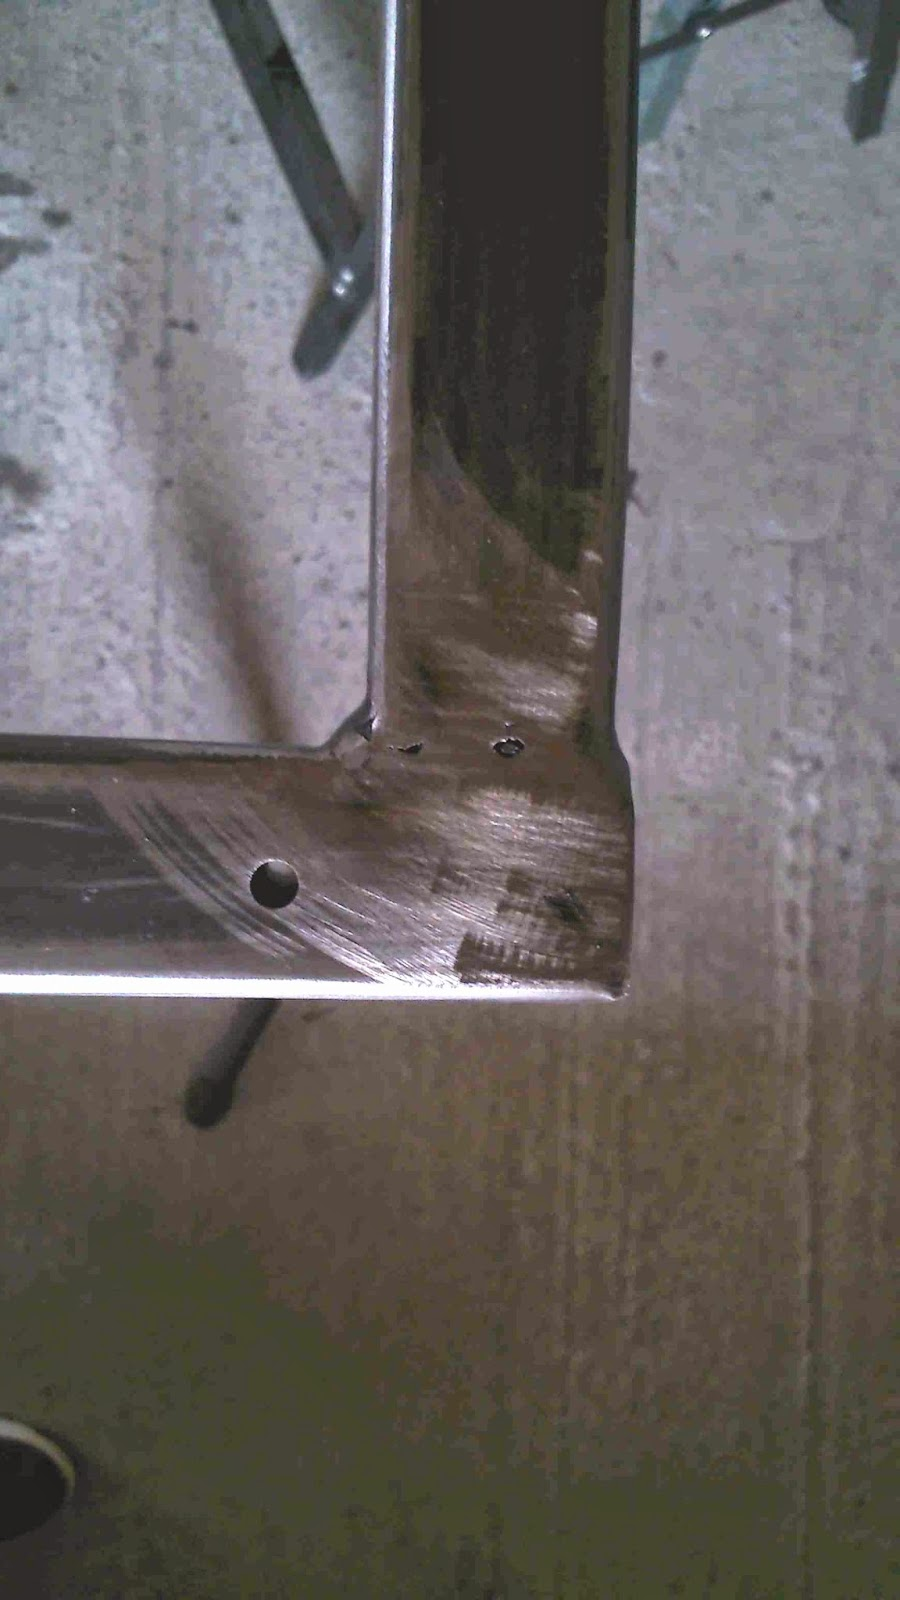 Marvelous tarif tube carre acier 12 cadre max min for Piscine acier carre